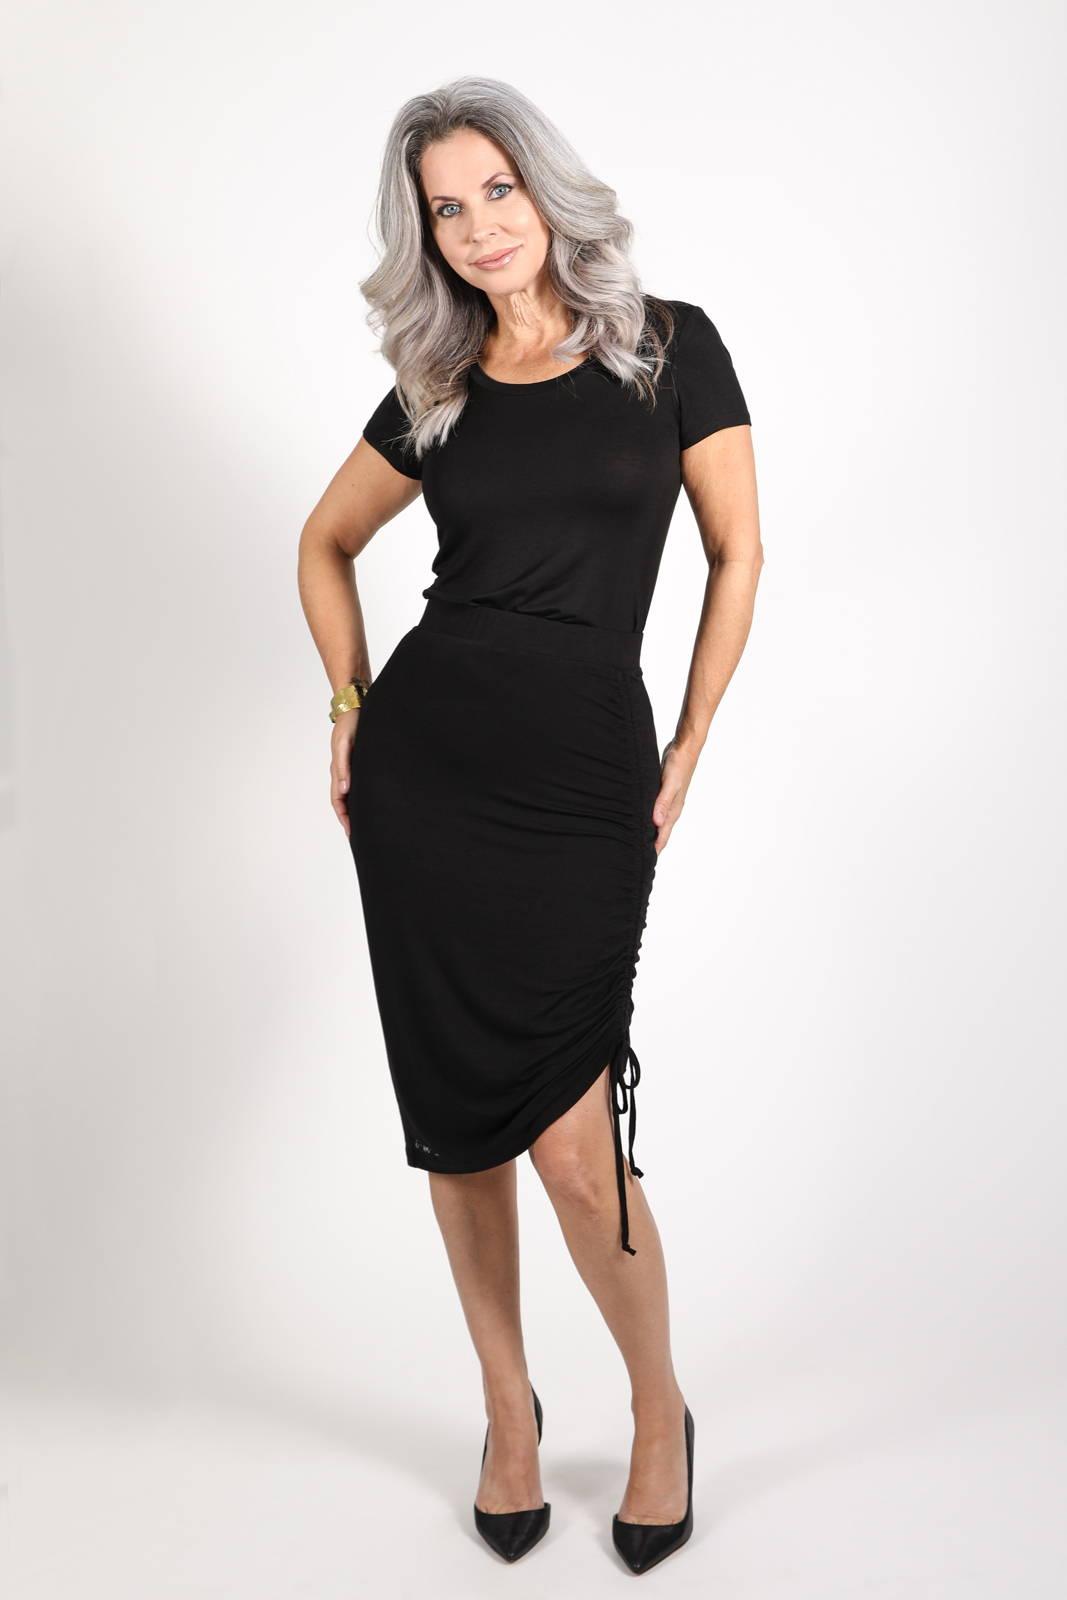 Model wearing the Dawl Tunic in black and Kuma Tie Skirt in Black